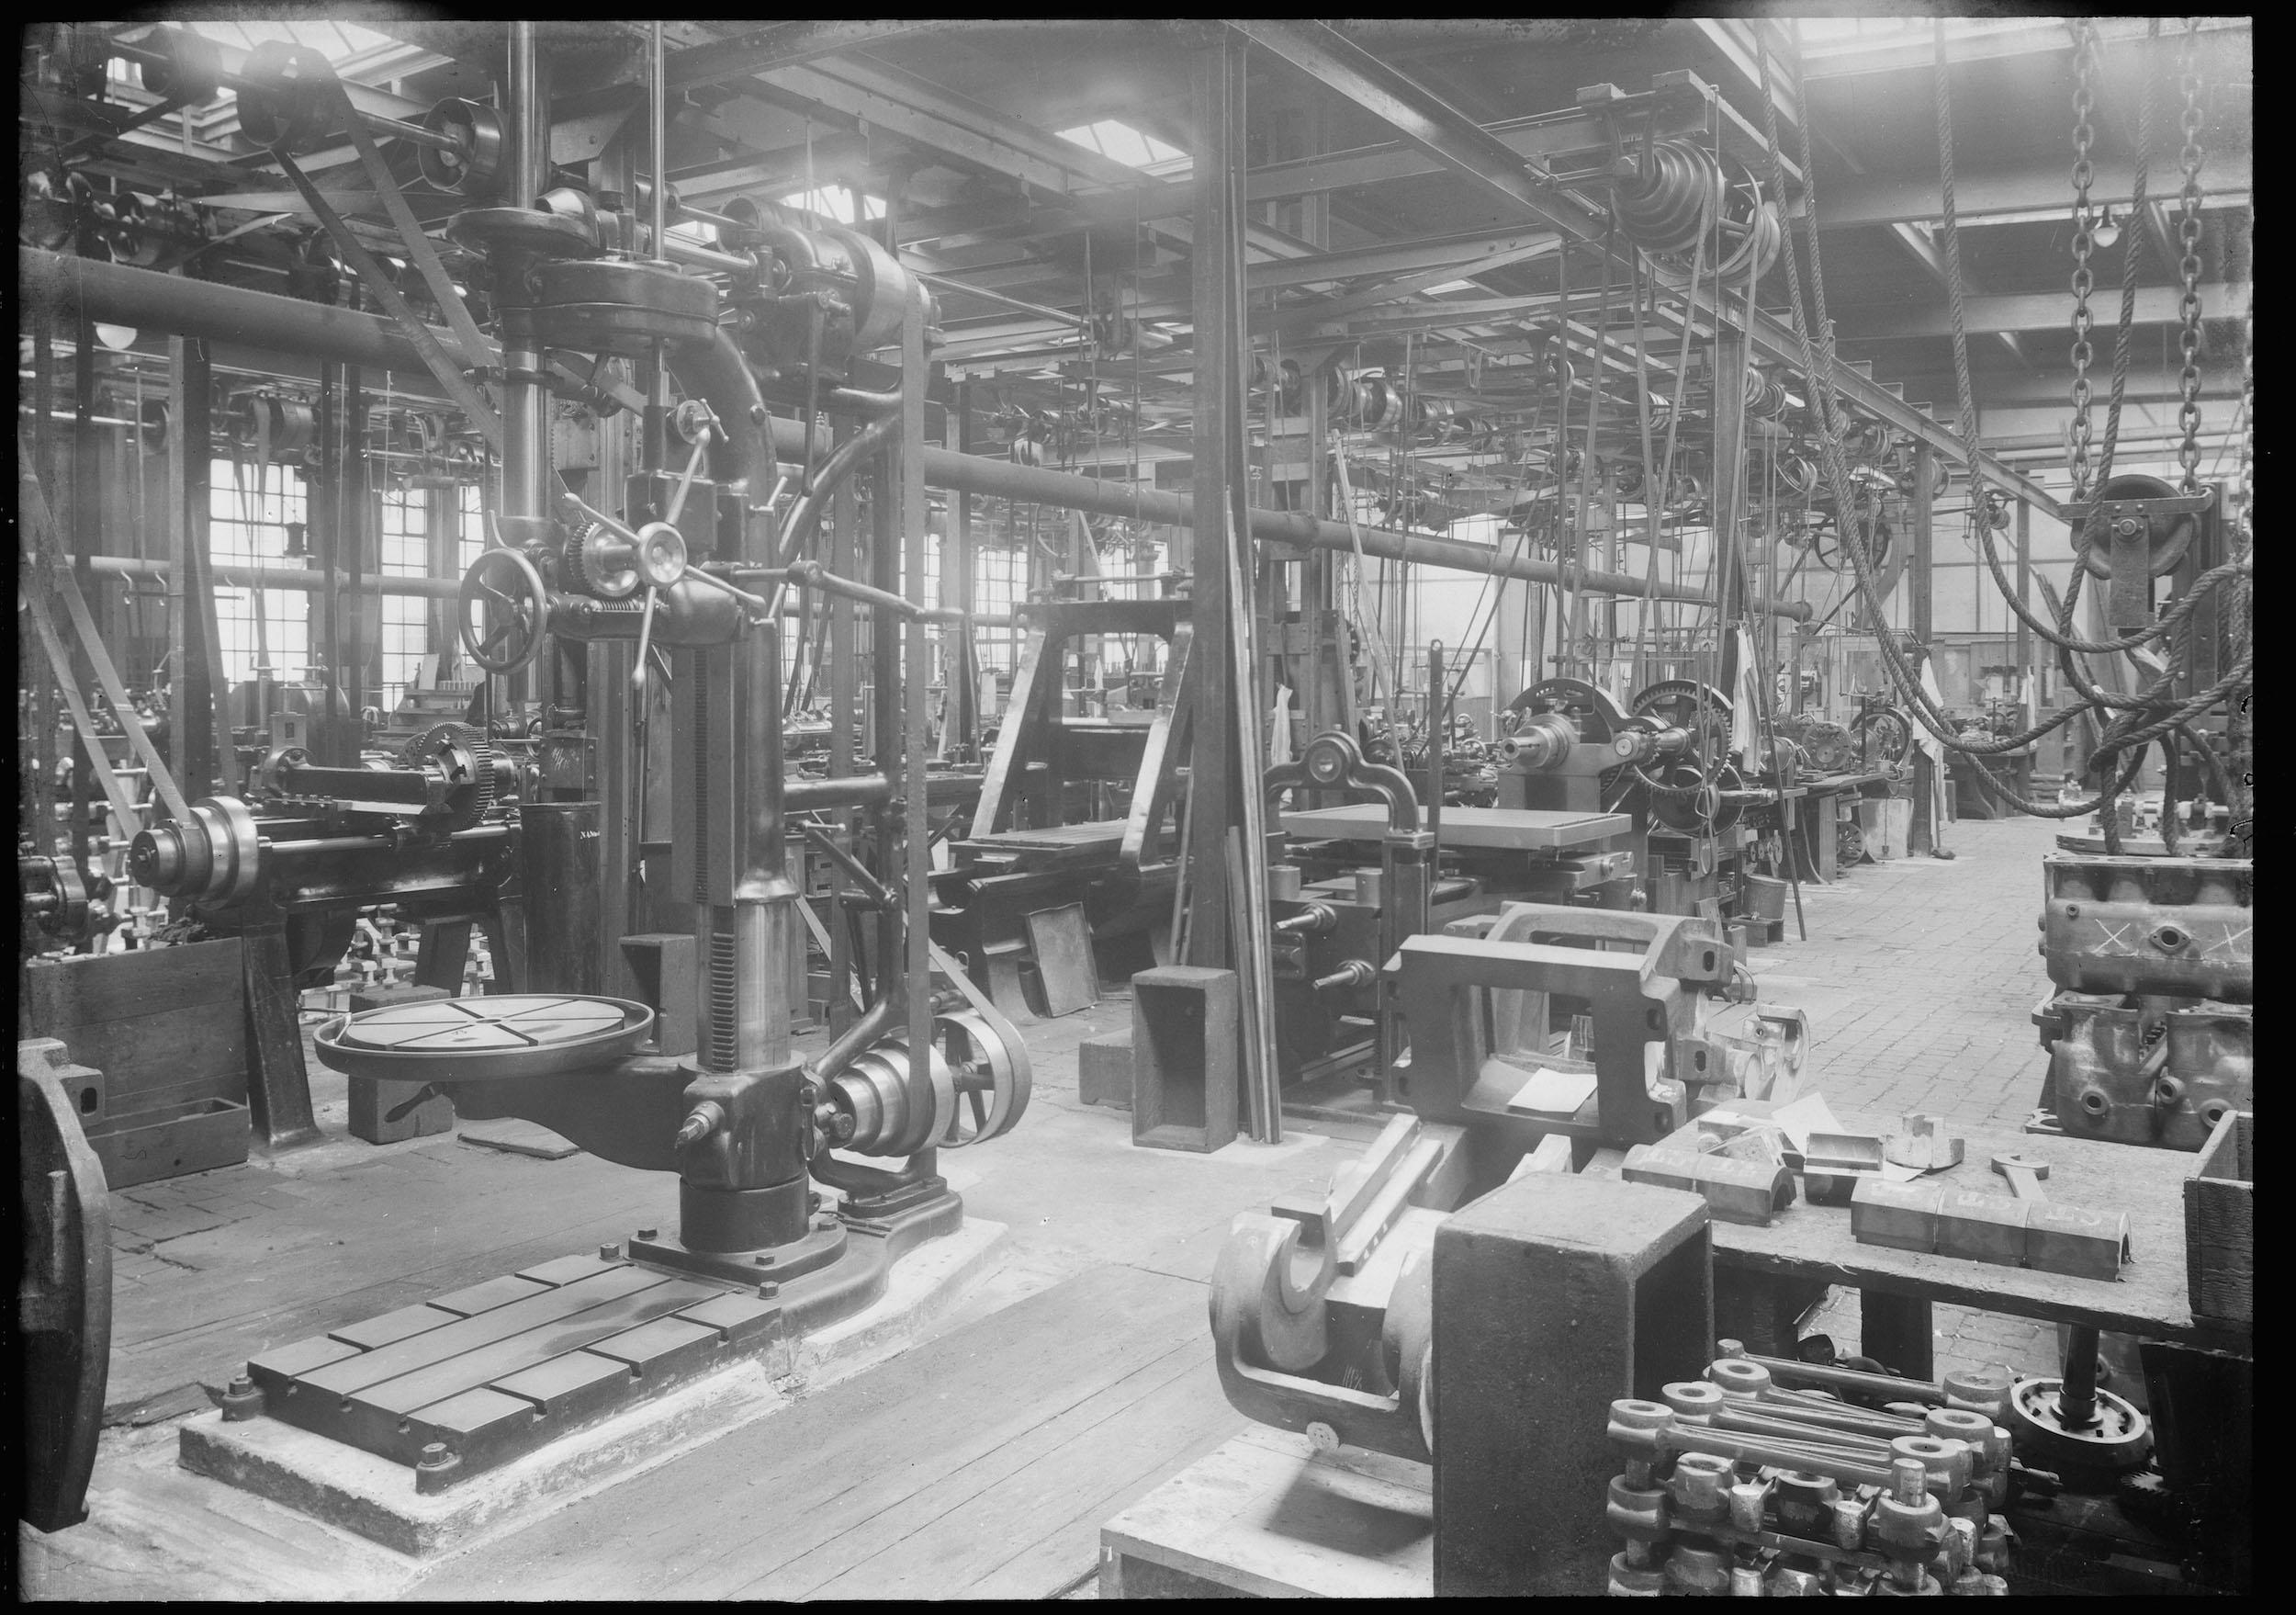 Martini Fabrik Bleicheareal Frauenfeld